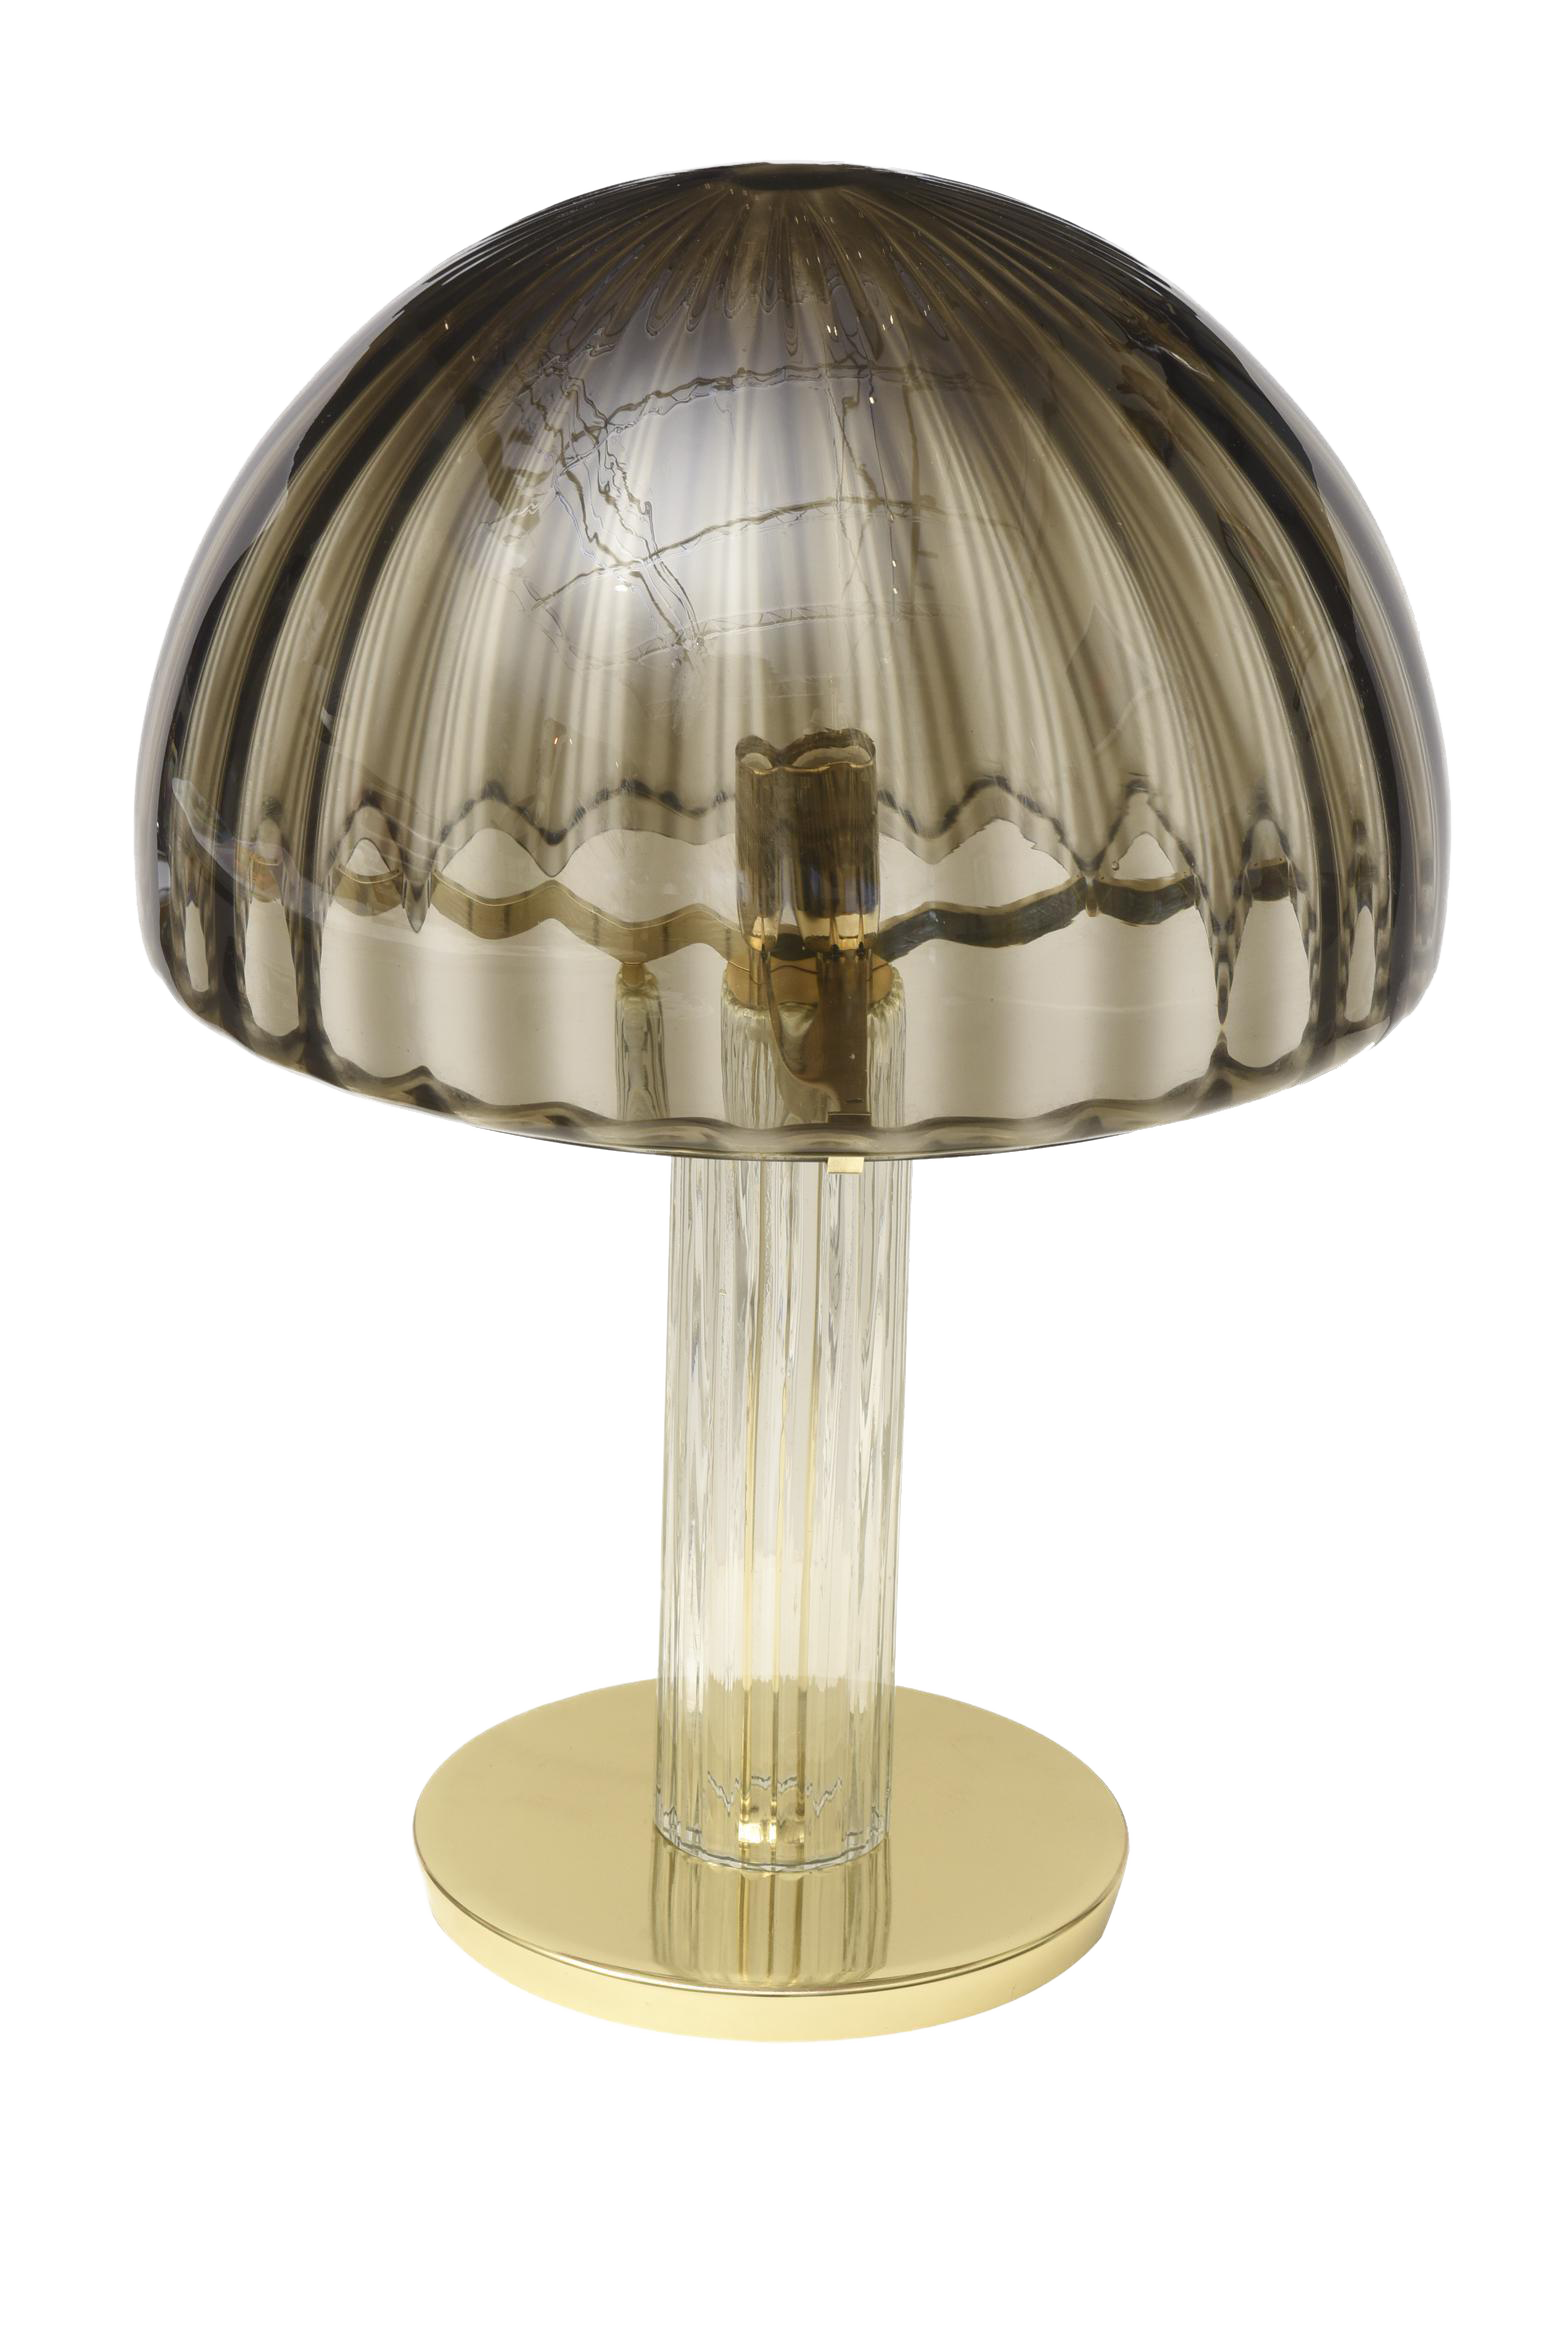 Italian Murano Vistosi Glass And Polished Brass Dome Table/Desk Lamp    Image 1 Of